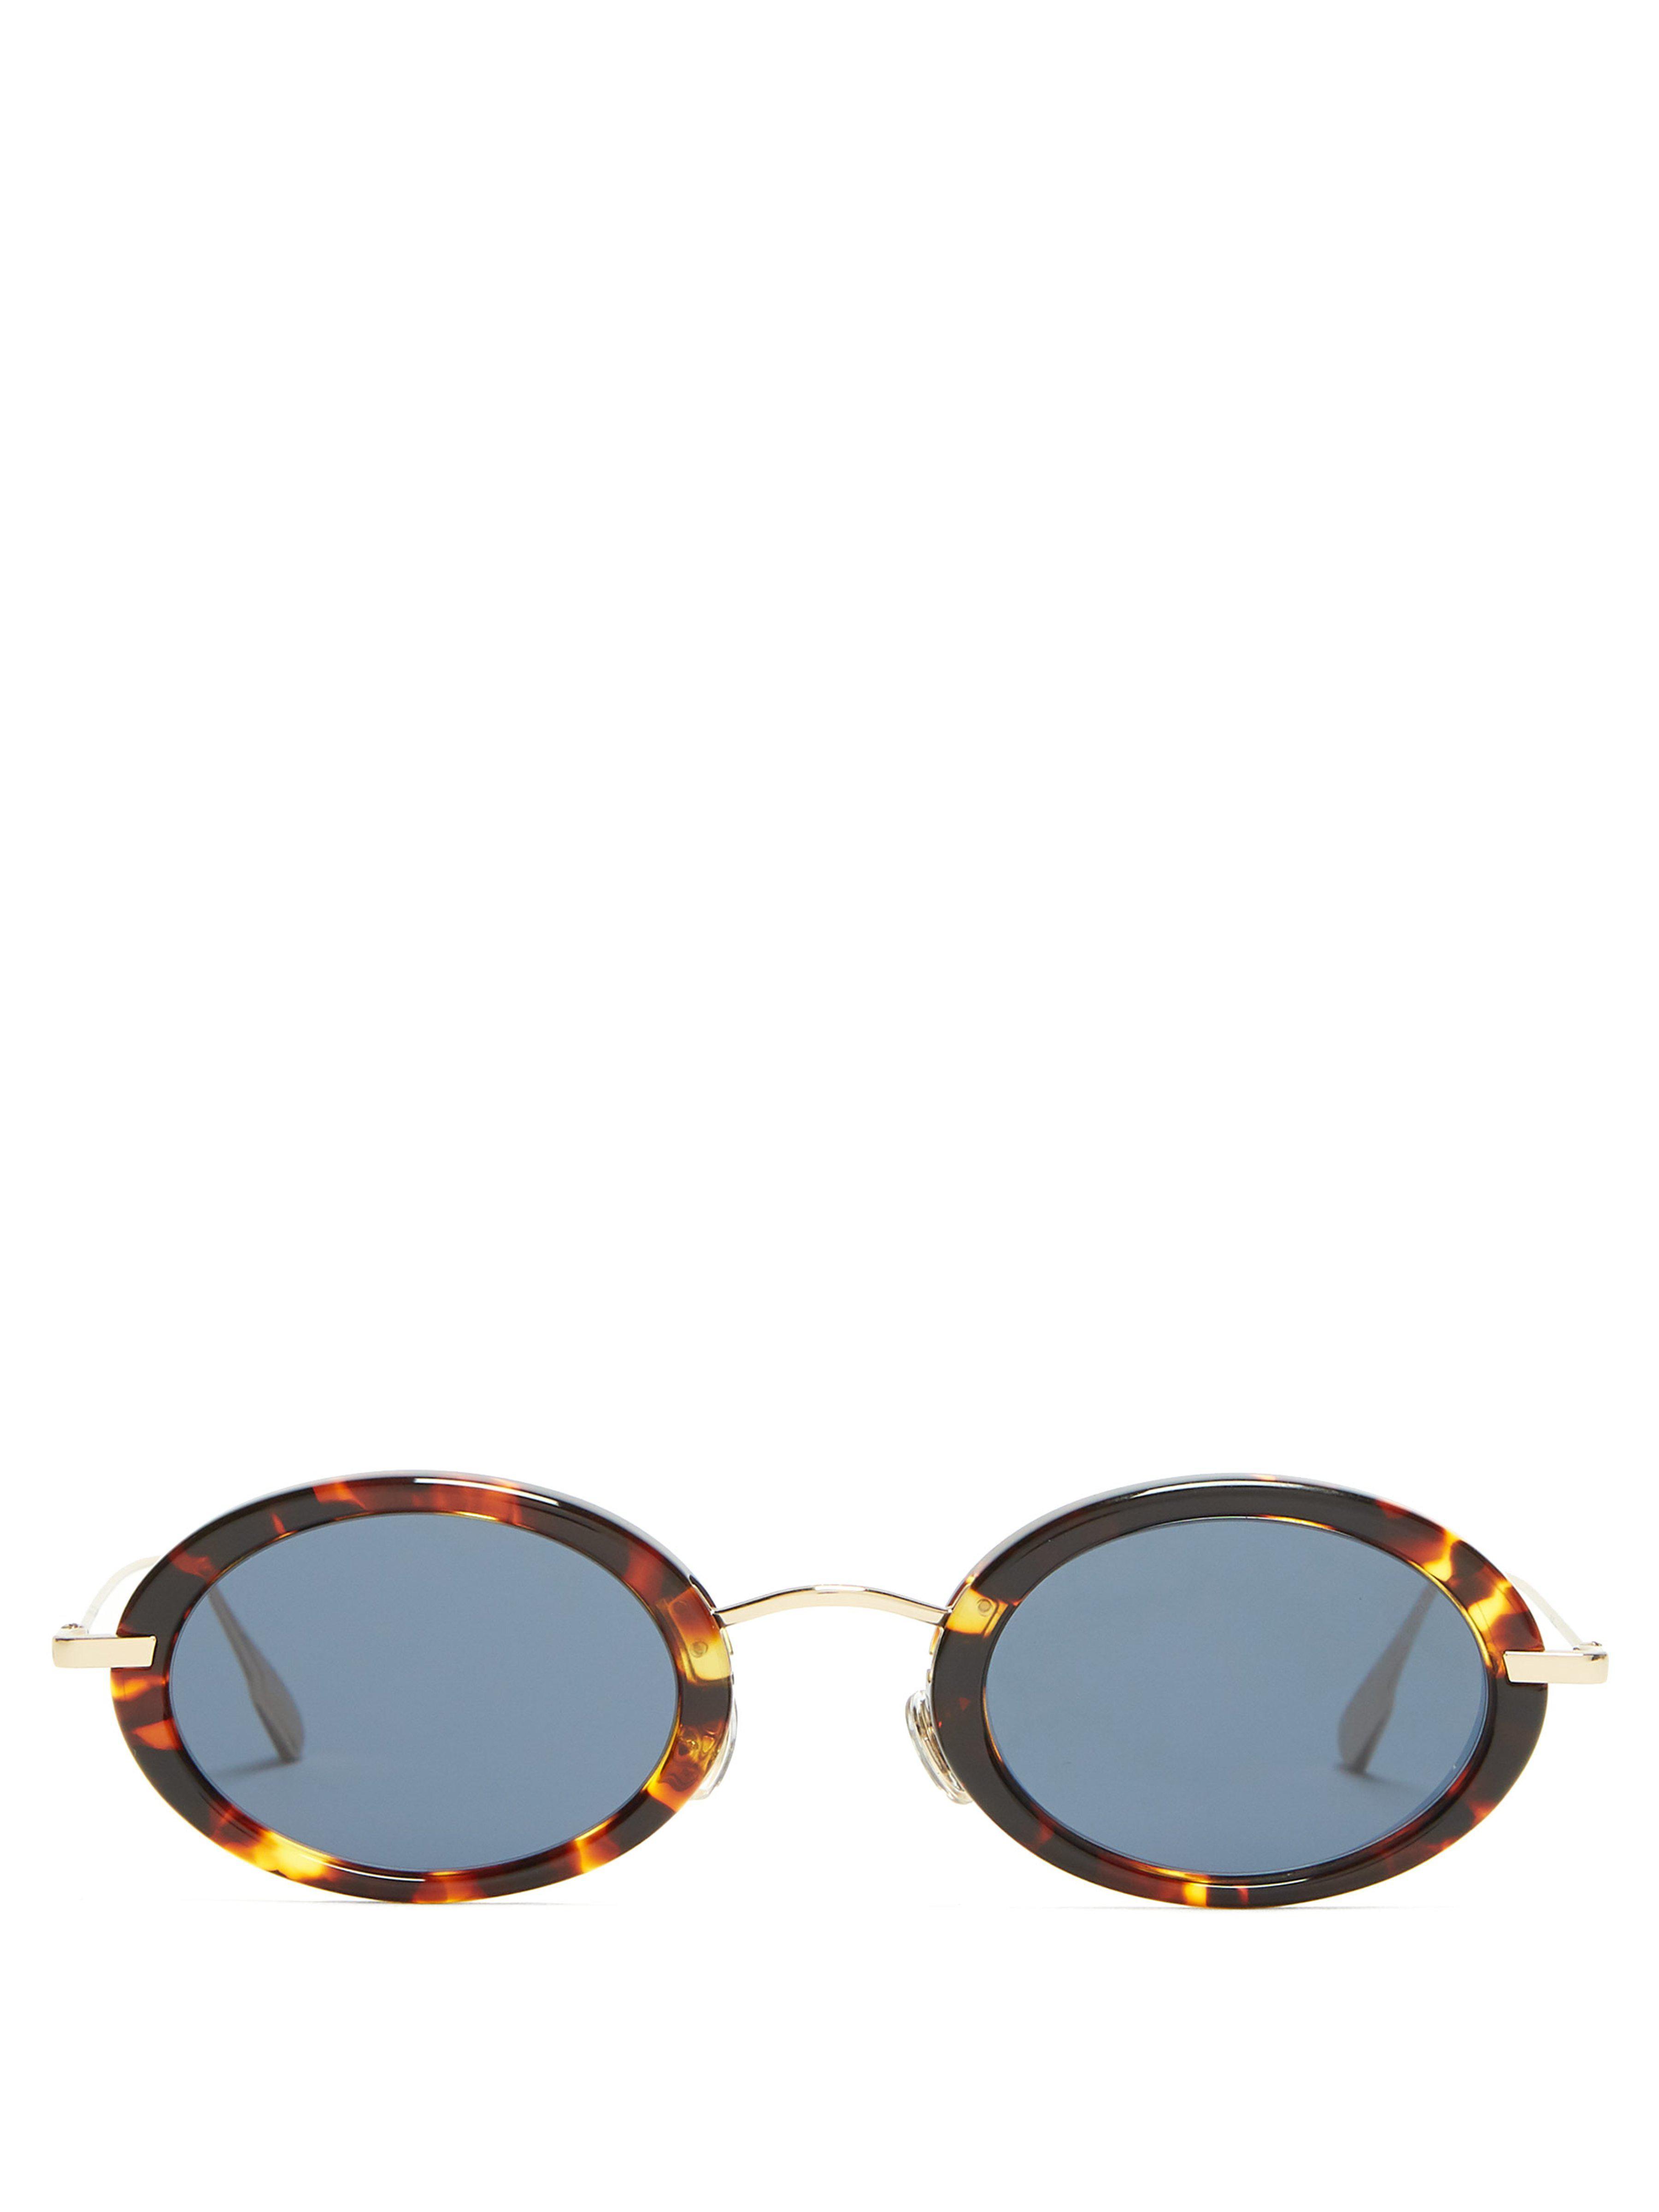 19cdc6572717 Dior. Women s Diorhypnotic2 Oval Tortoiseshell Sunglasses